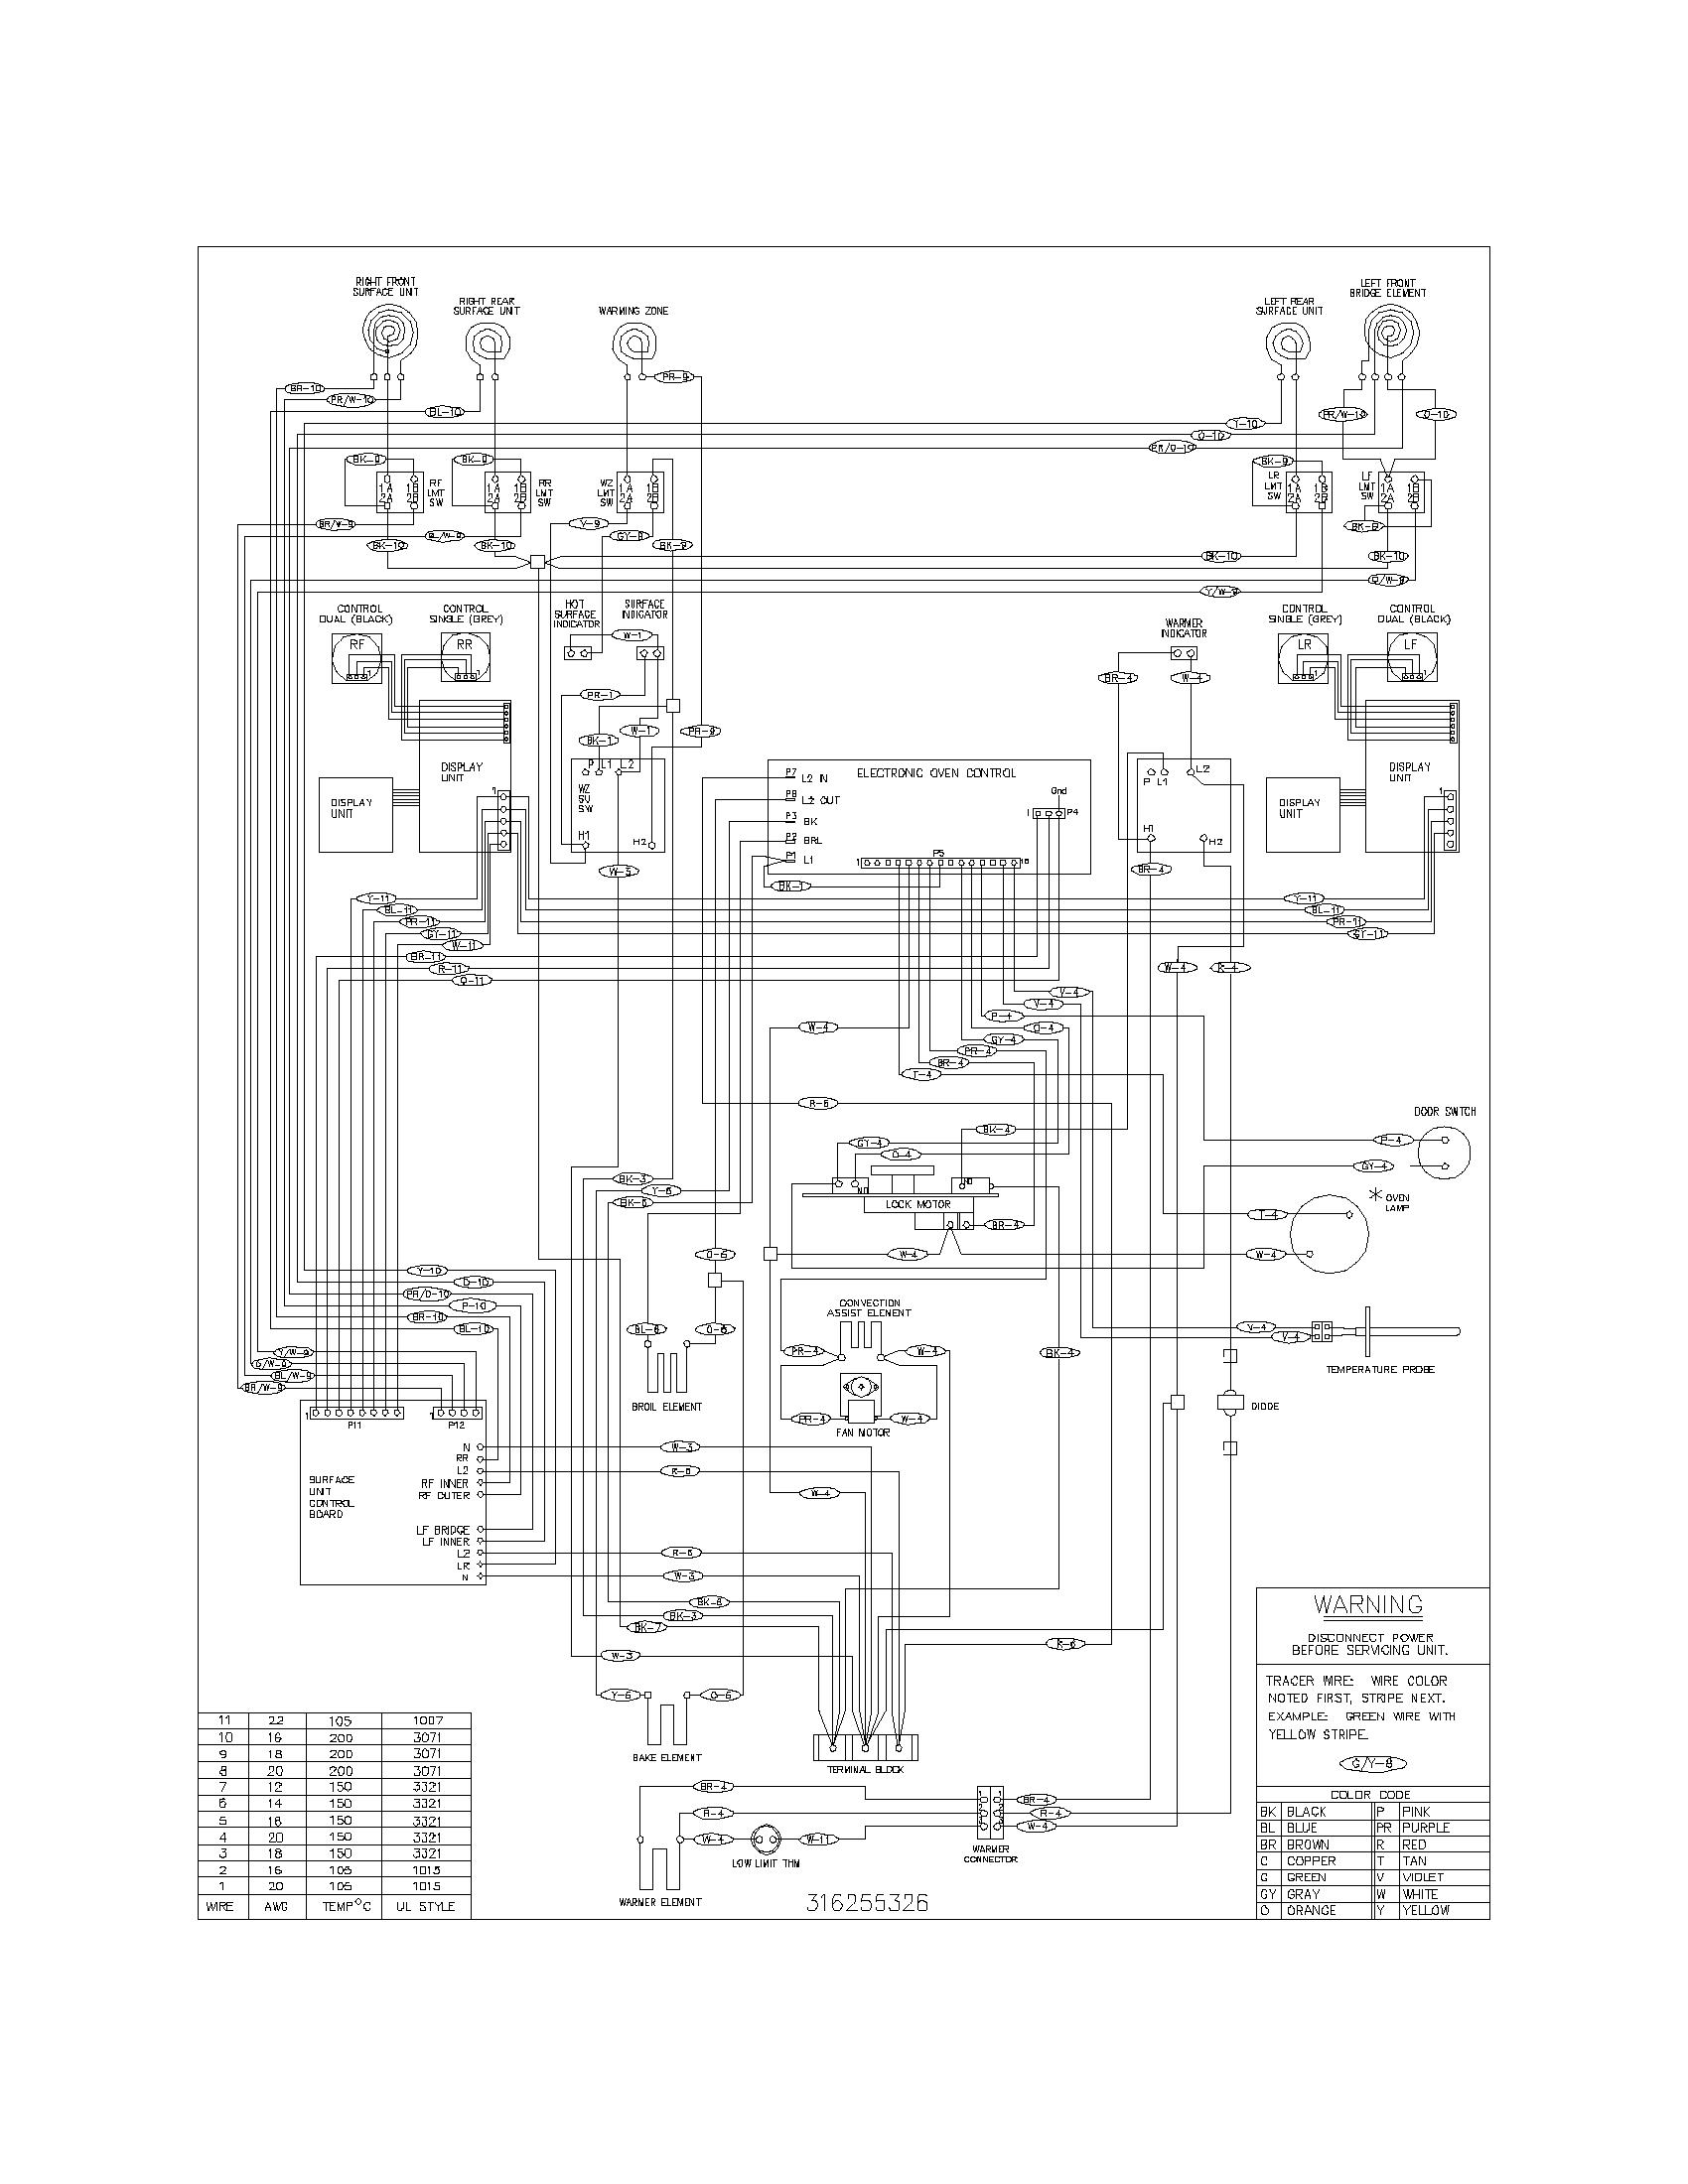 M Hec Oven Wiring Diagram